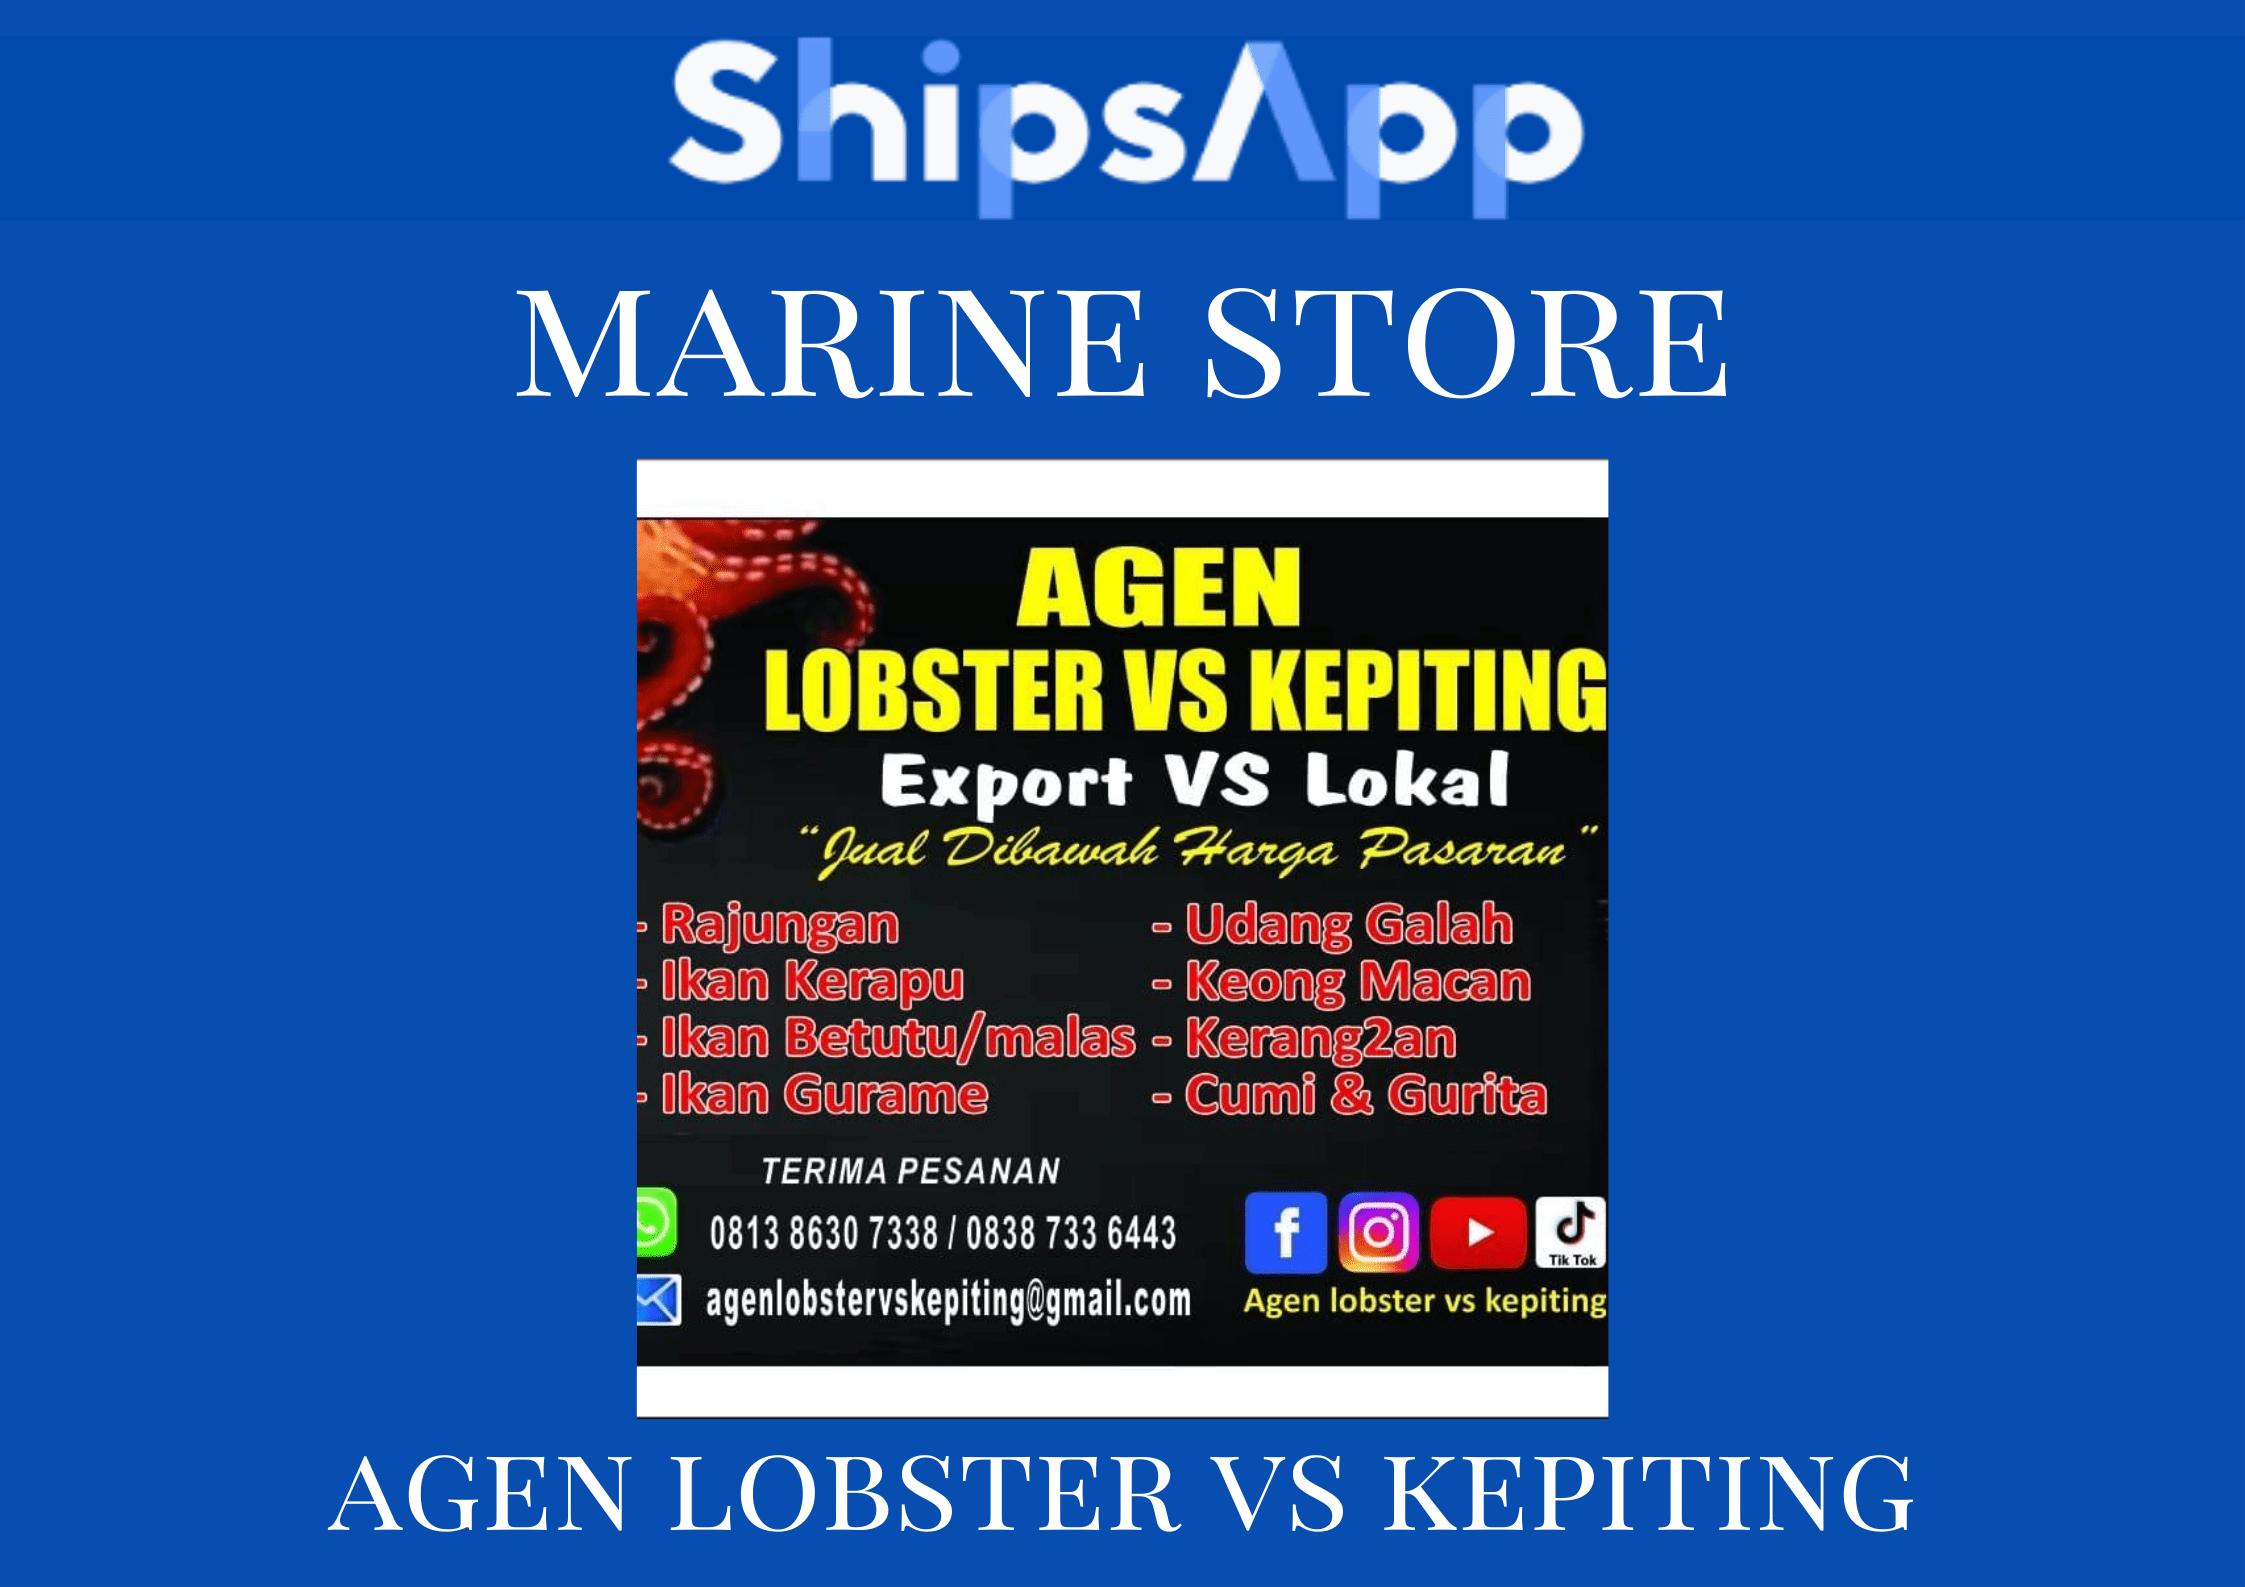 Marine Store Agen Lobster VS Kepiting